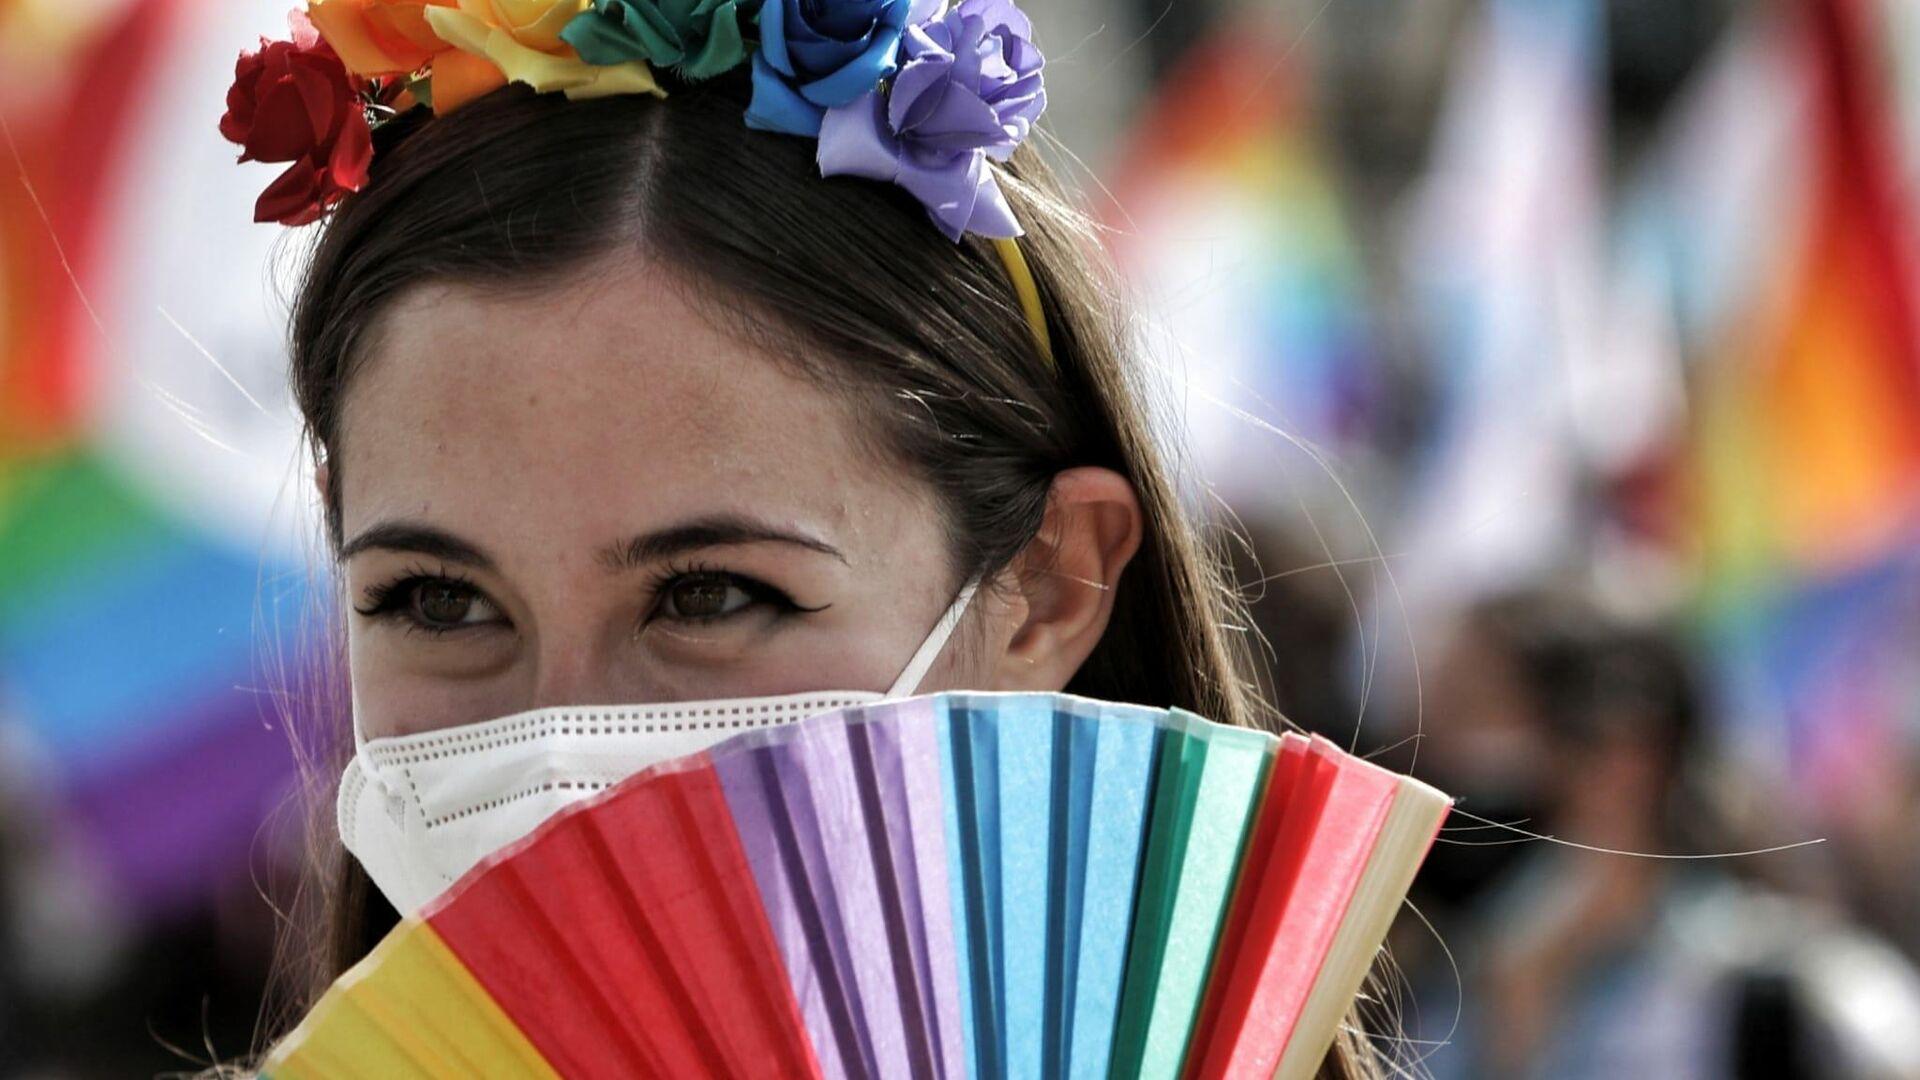 Attivista per i diritti gay - Sputnik Italia, 1920, 17.09.2021